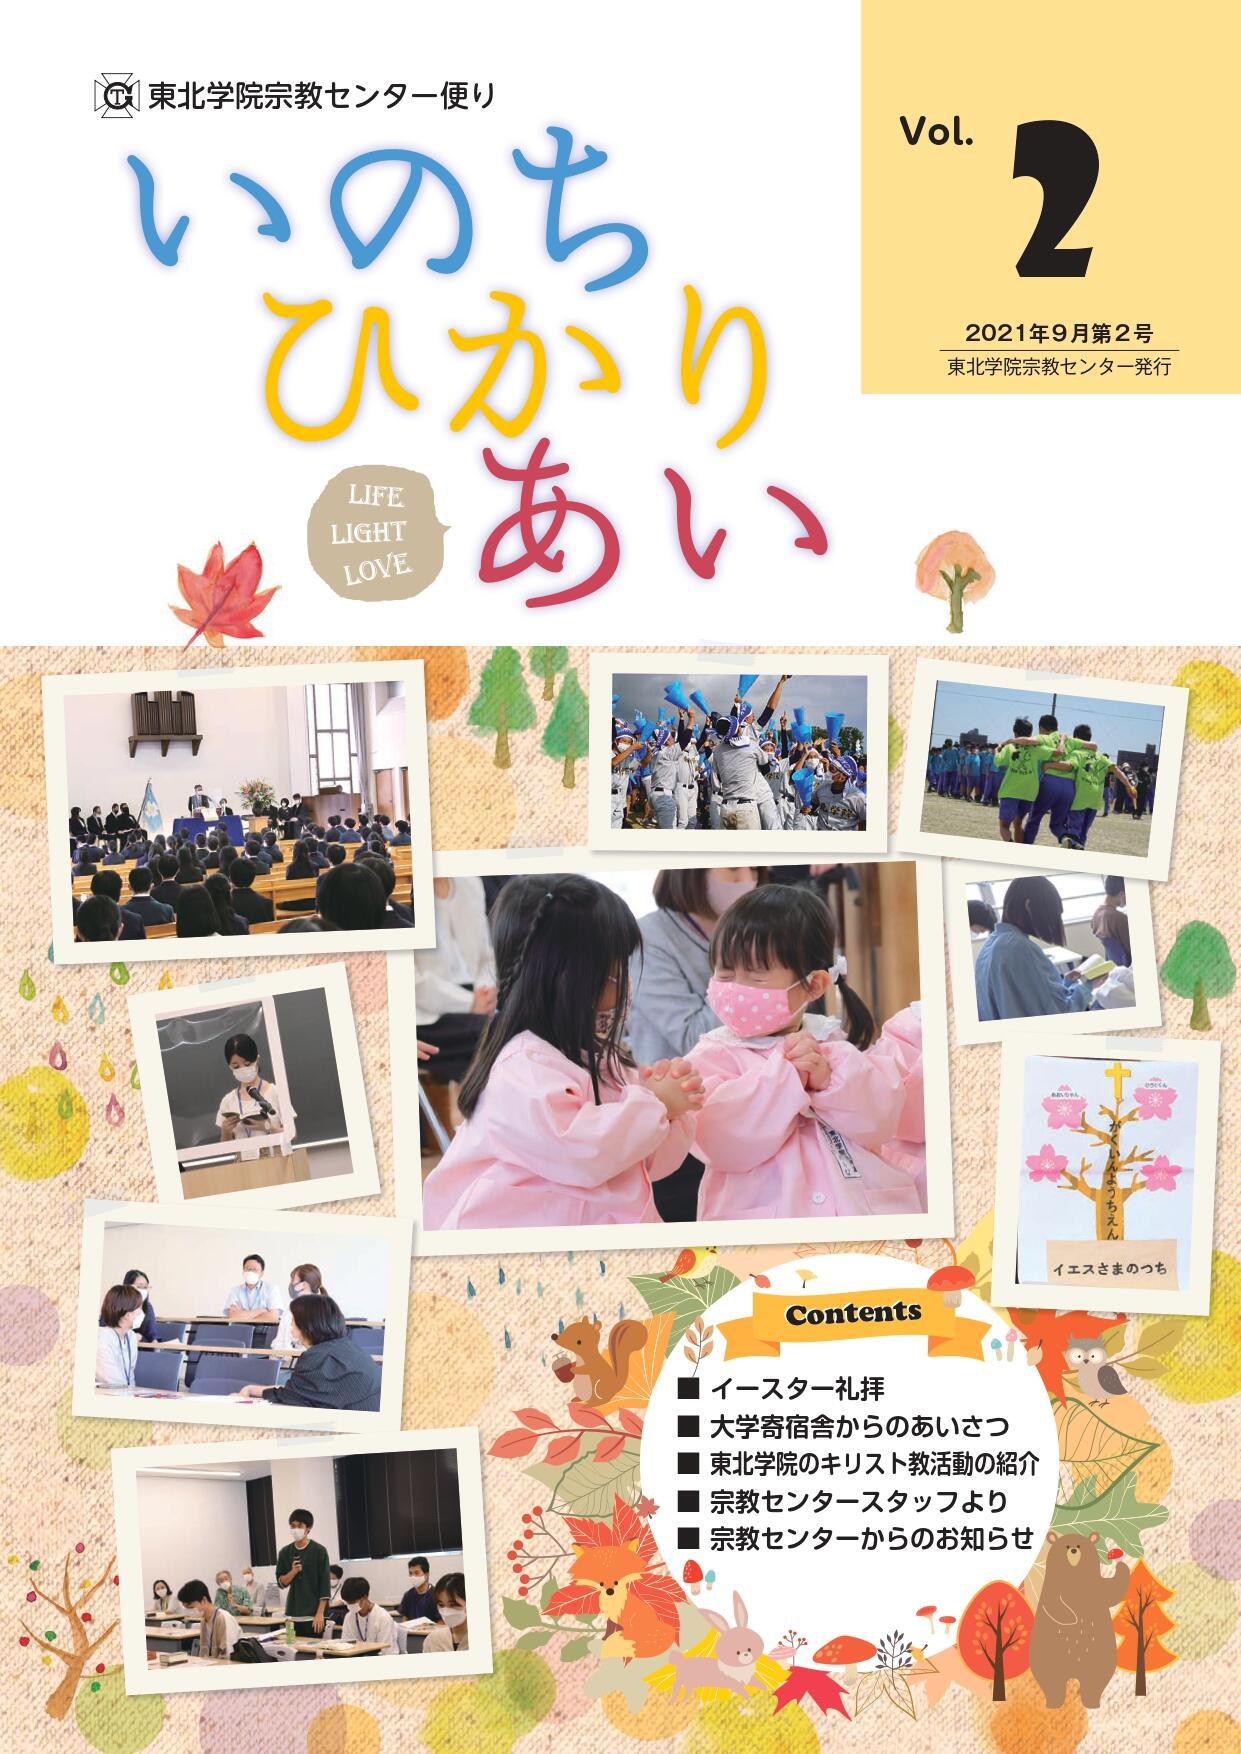 https://www.tohoku-gakuin.ac.jp/info/content/210908-2_1.jpg